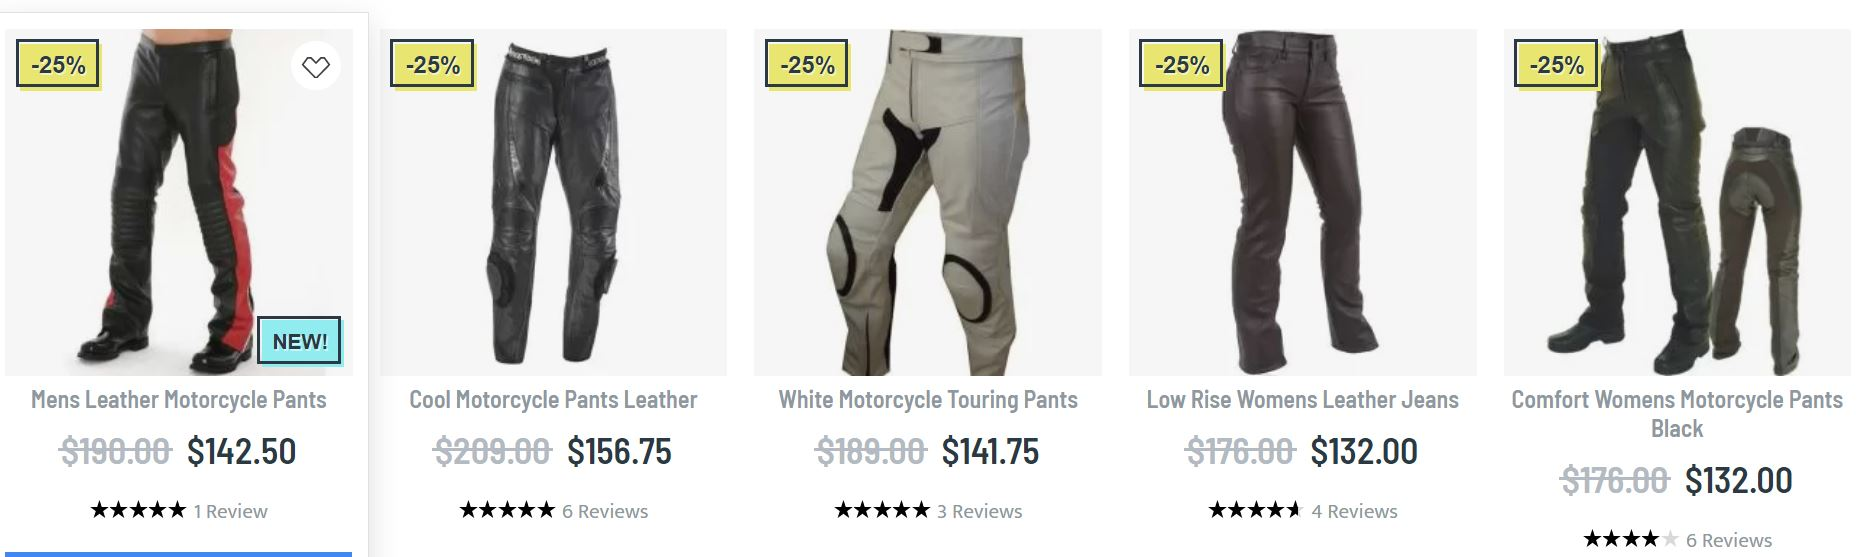 Motogp pants